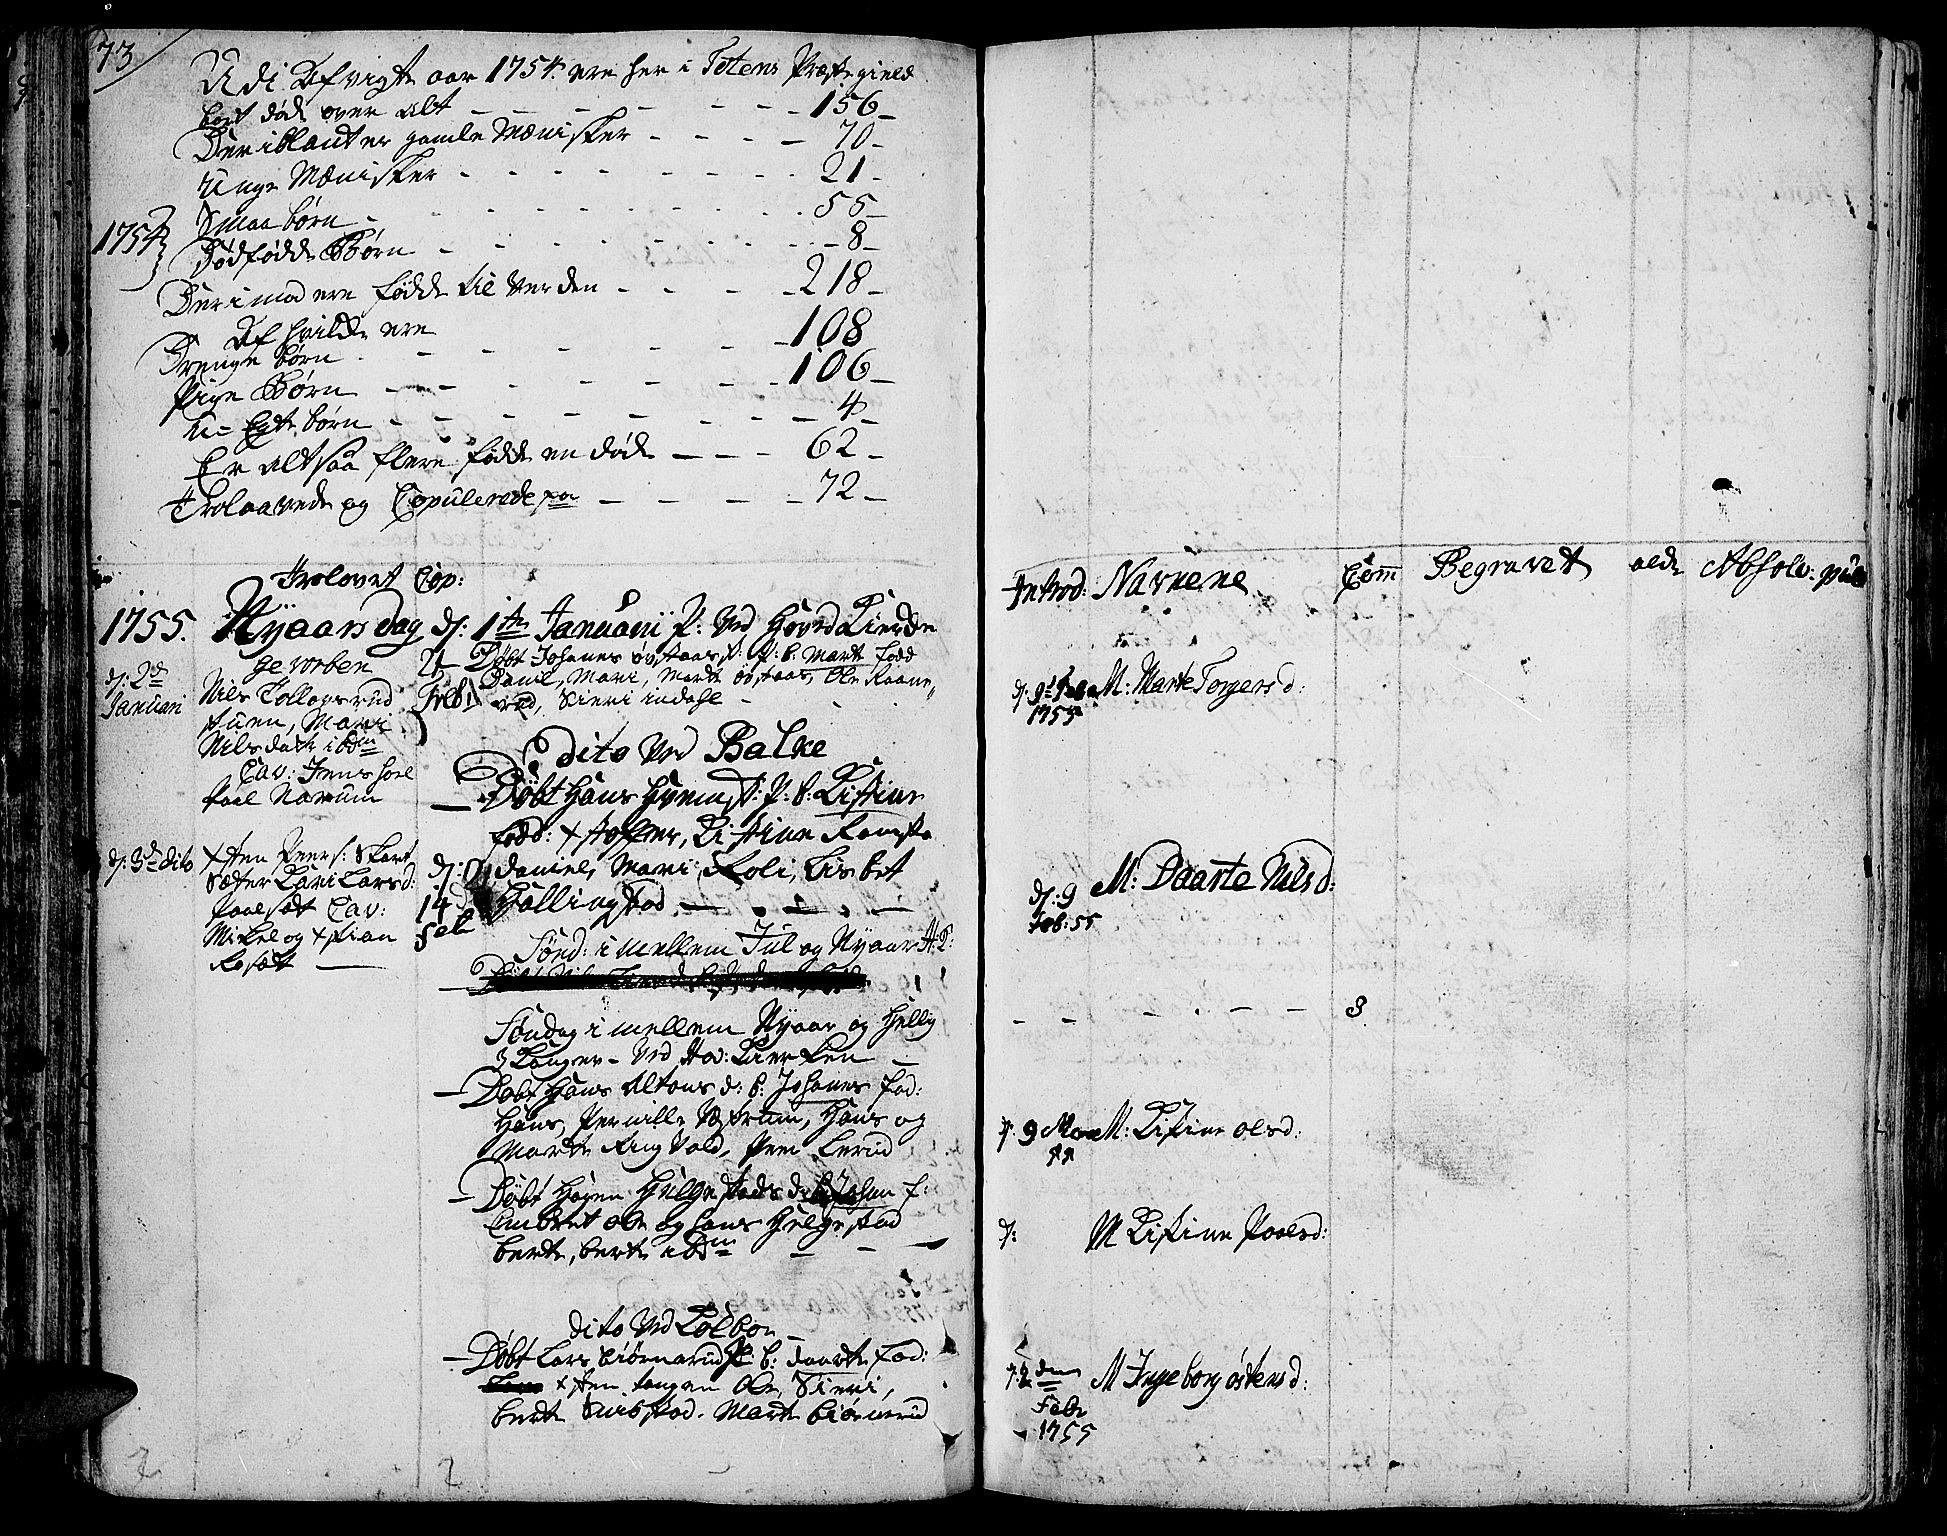 SAH, Toten prestekontor, Ministerialbok nr. 4, 1751-1761, s. 73